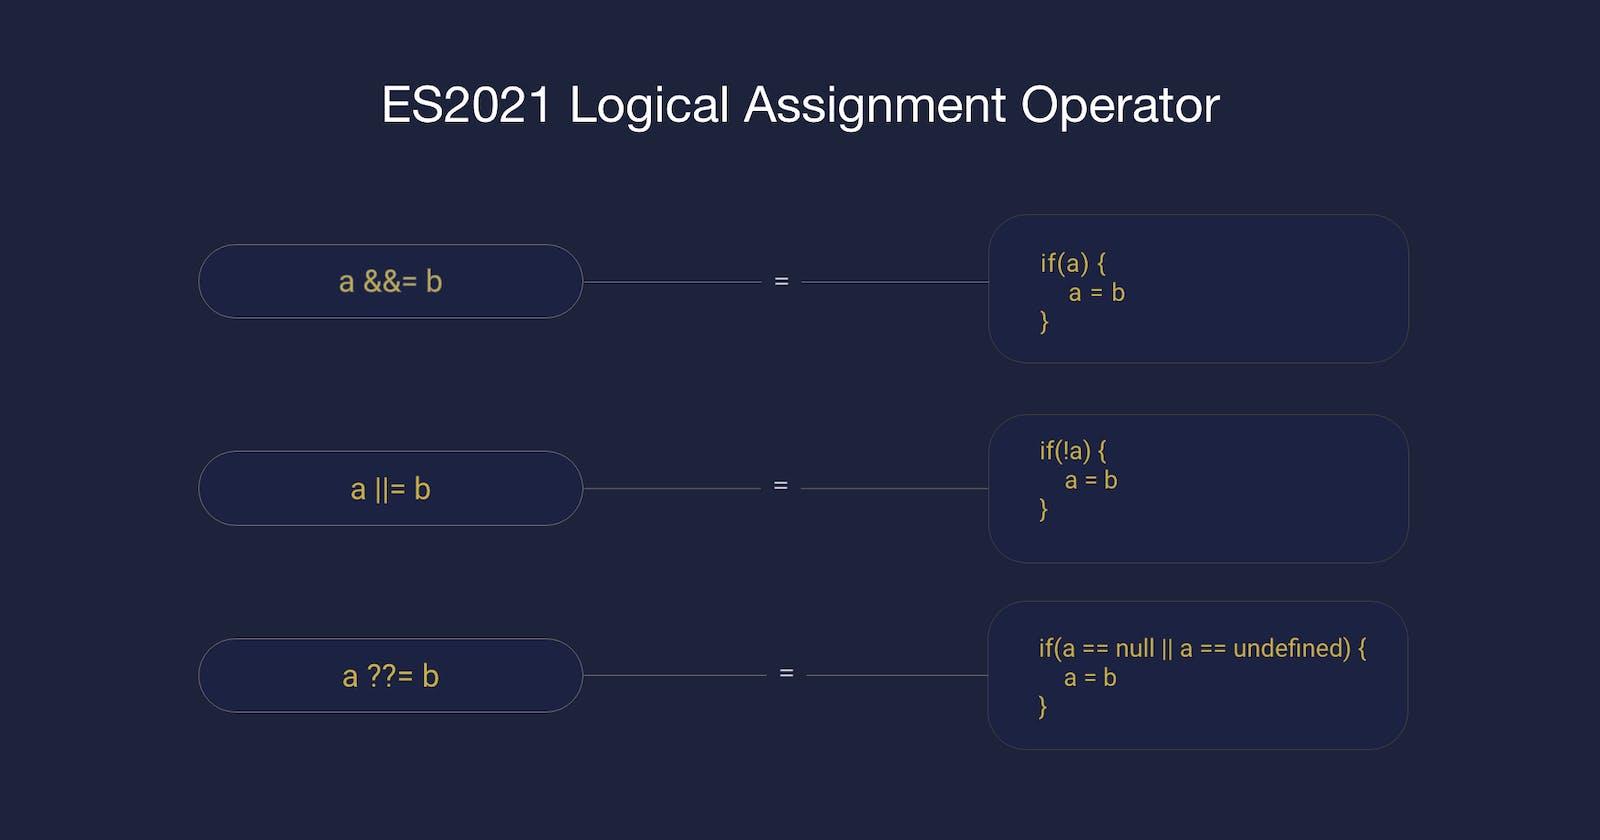 ES2021 - Logical Assignment Operator